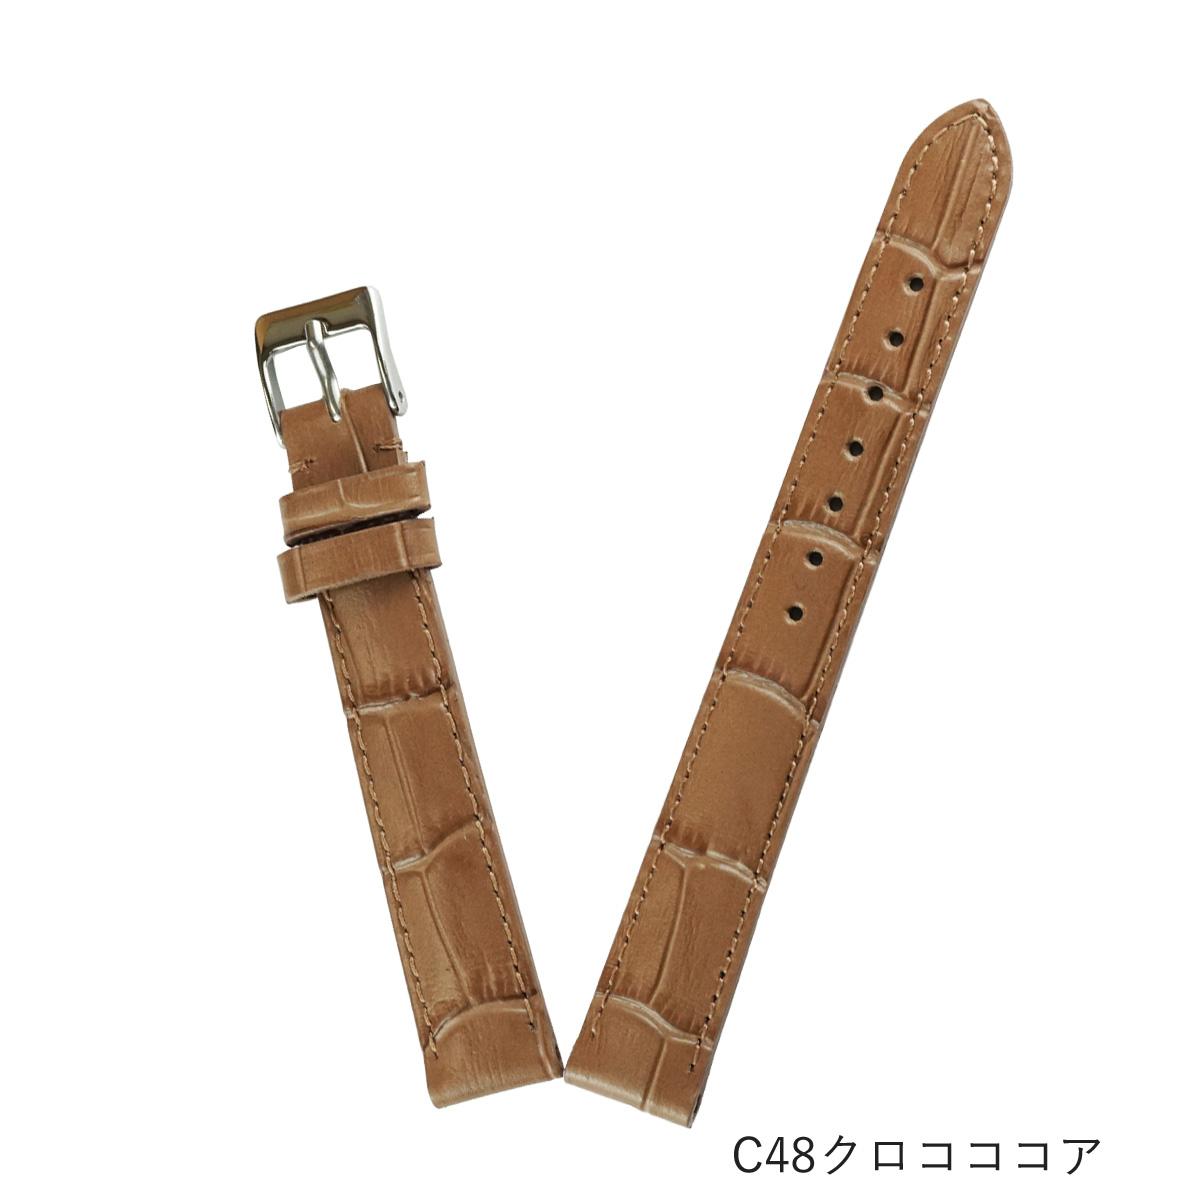 12mm 腕時計ベルト ノーブル 牛革クロコ型押しベルト